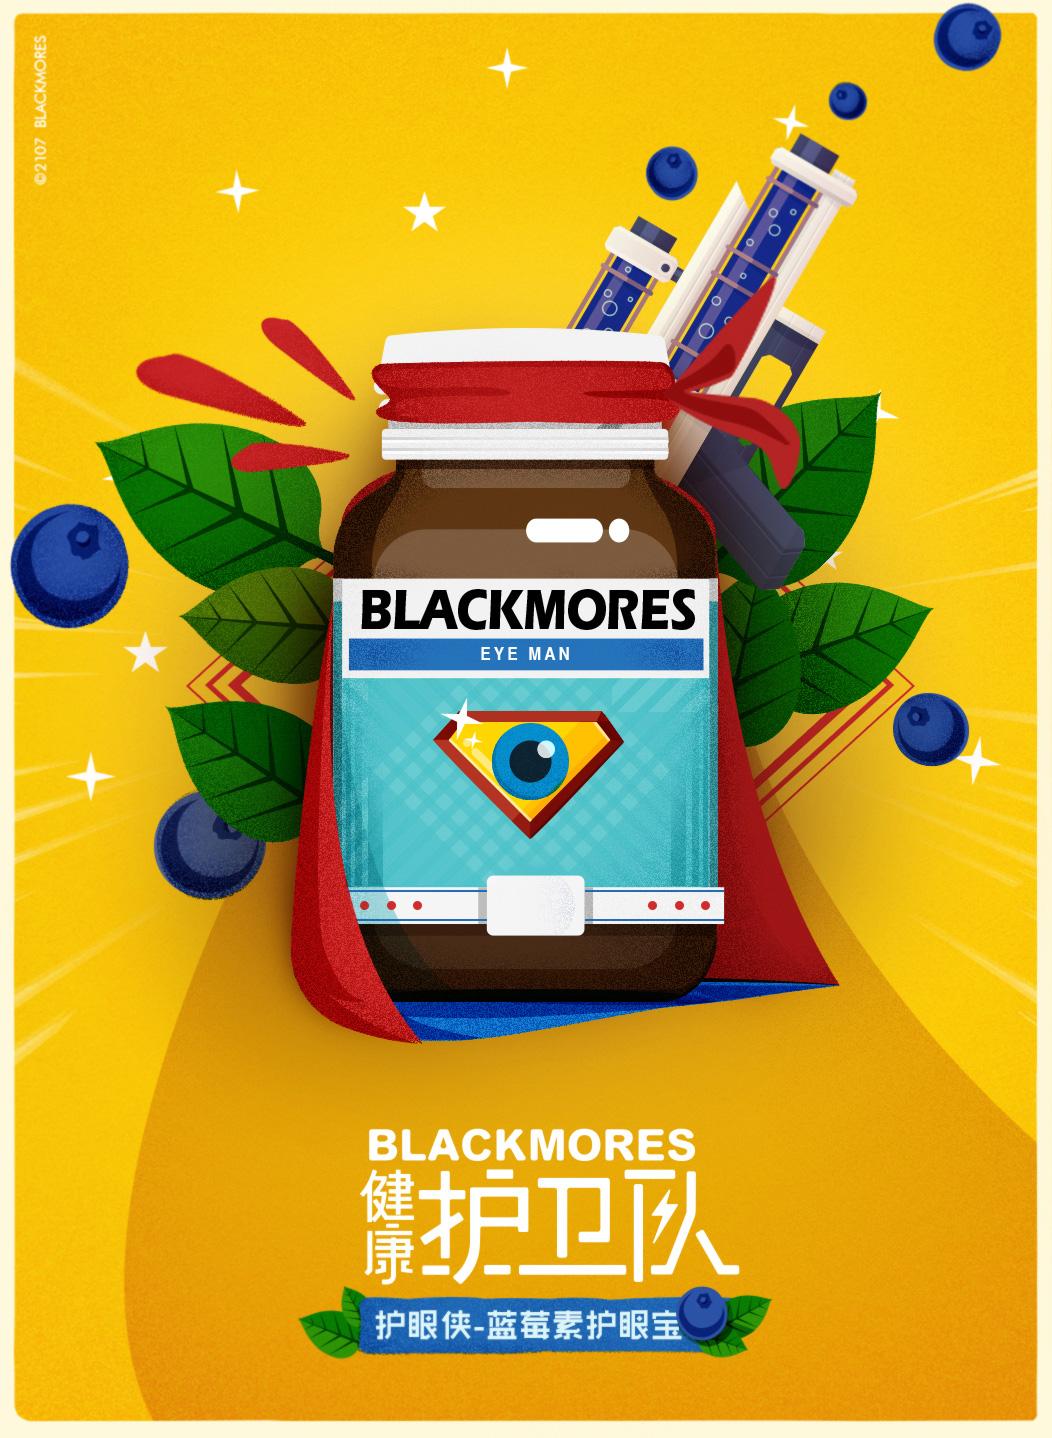 blackmores-kv2副本